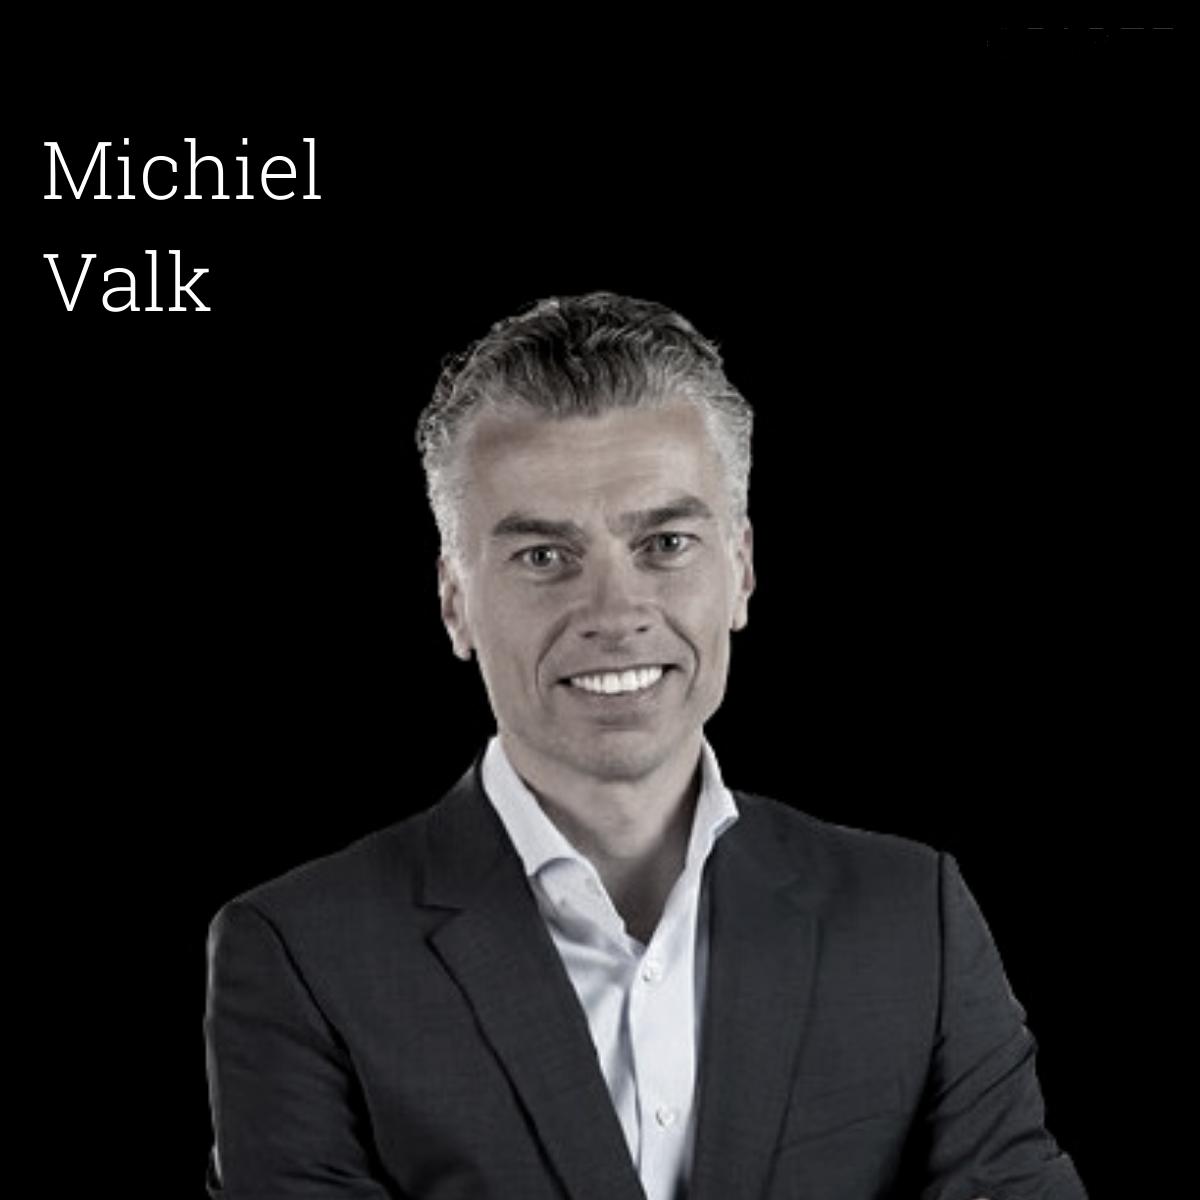 Chief Impact Officer with Michiel Valk (Dutch)